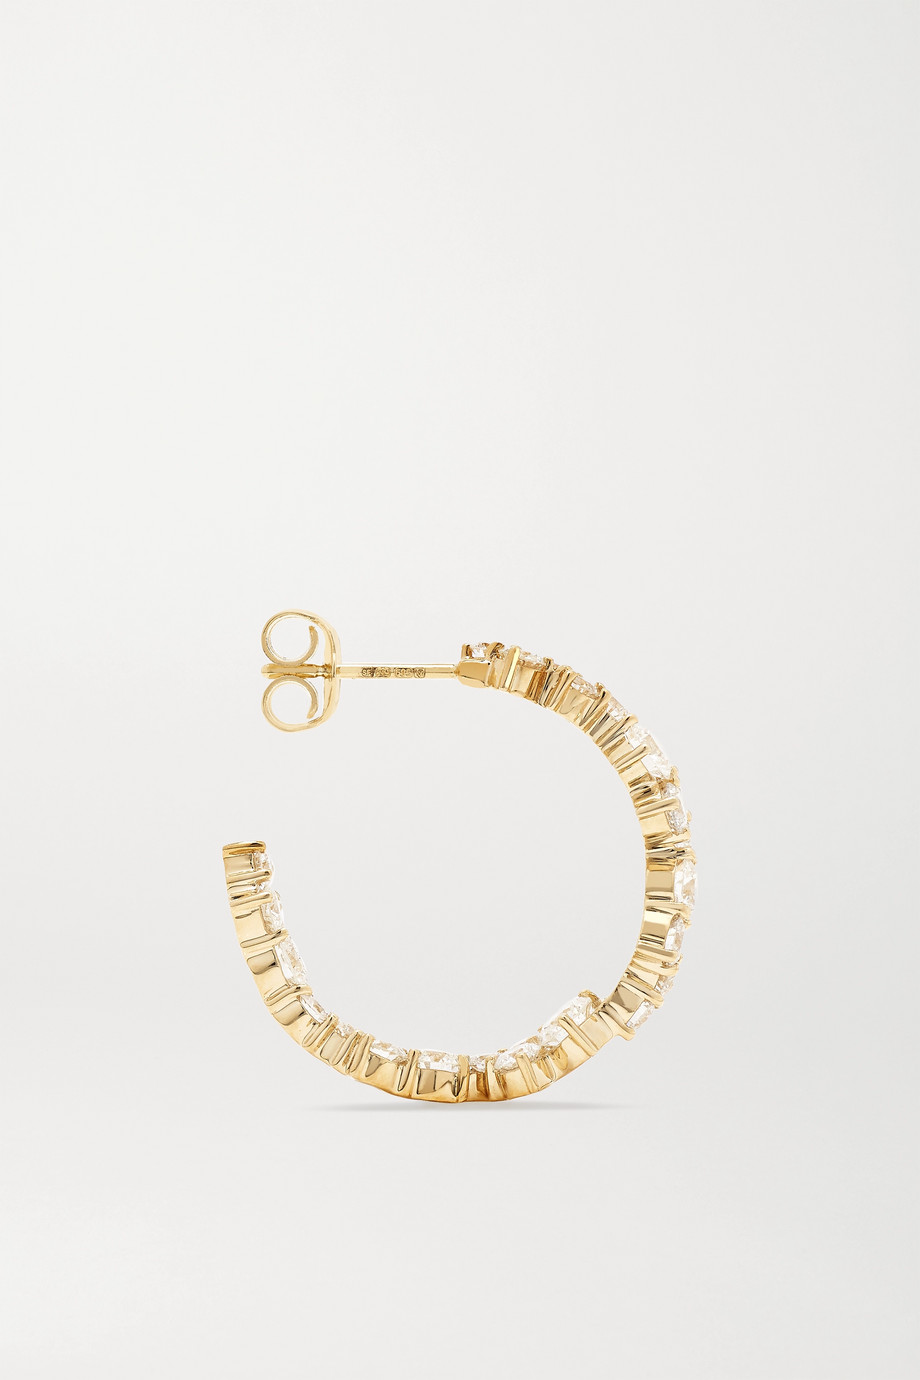 Sydney Evan Große Creolen aus 14 Karat Gold mit Diamanten